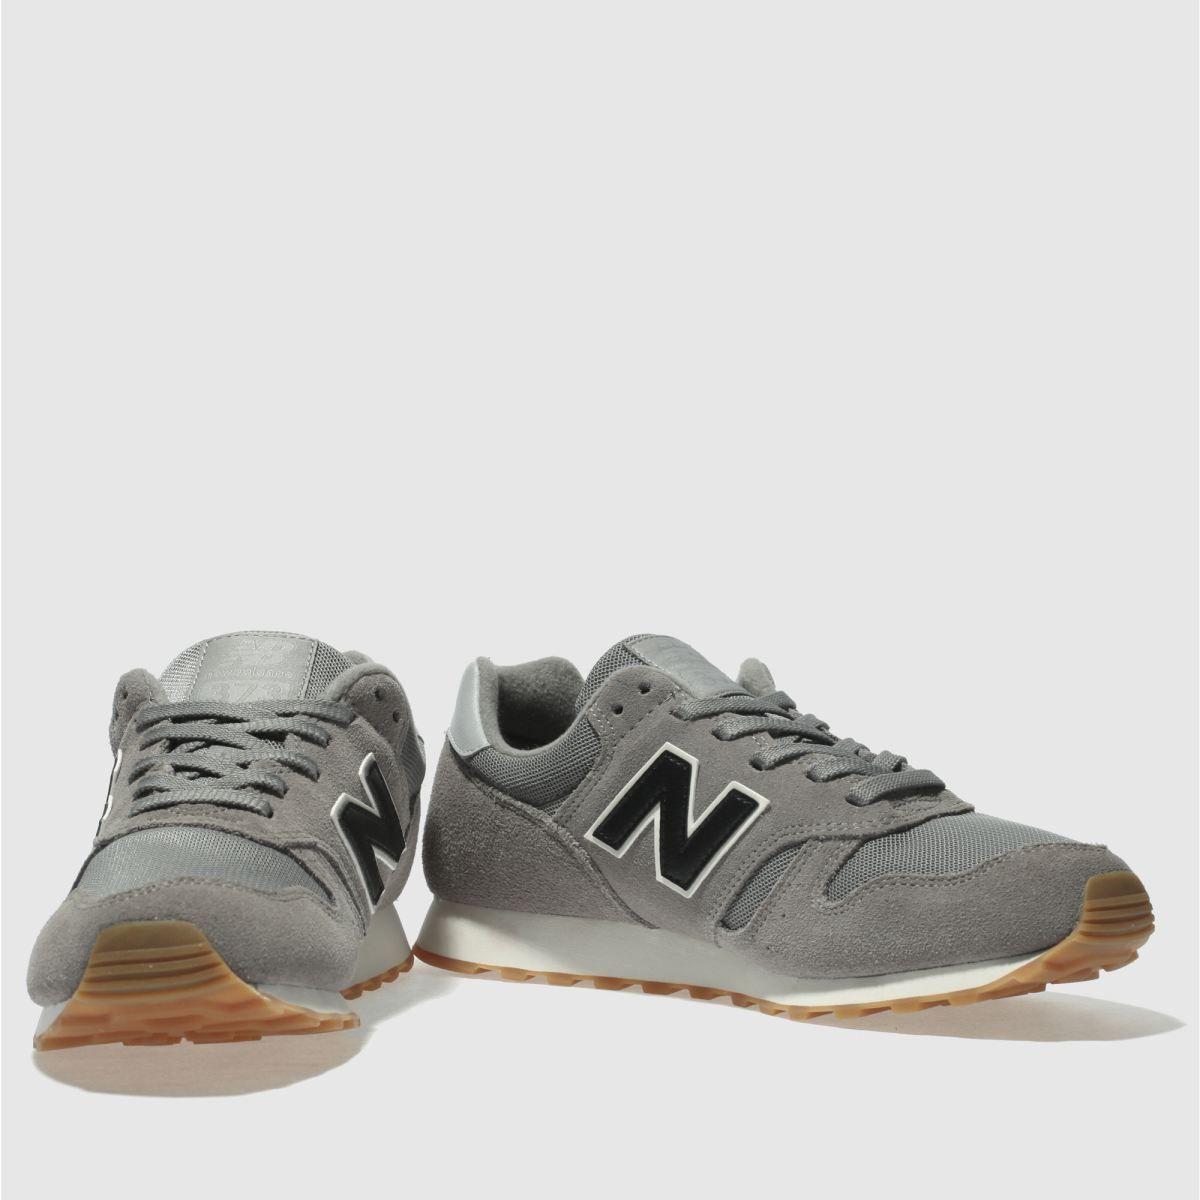 new balance 373 25